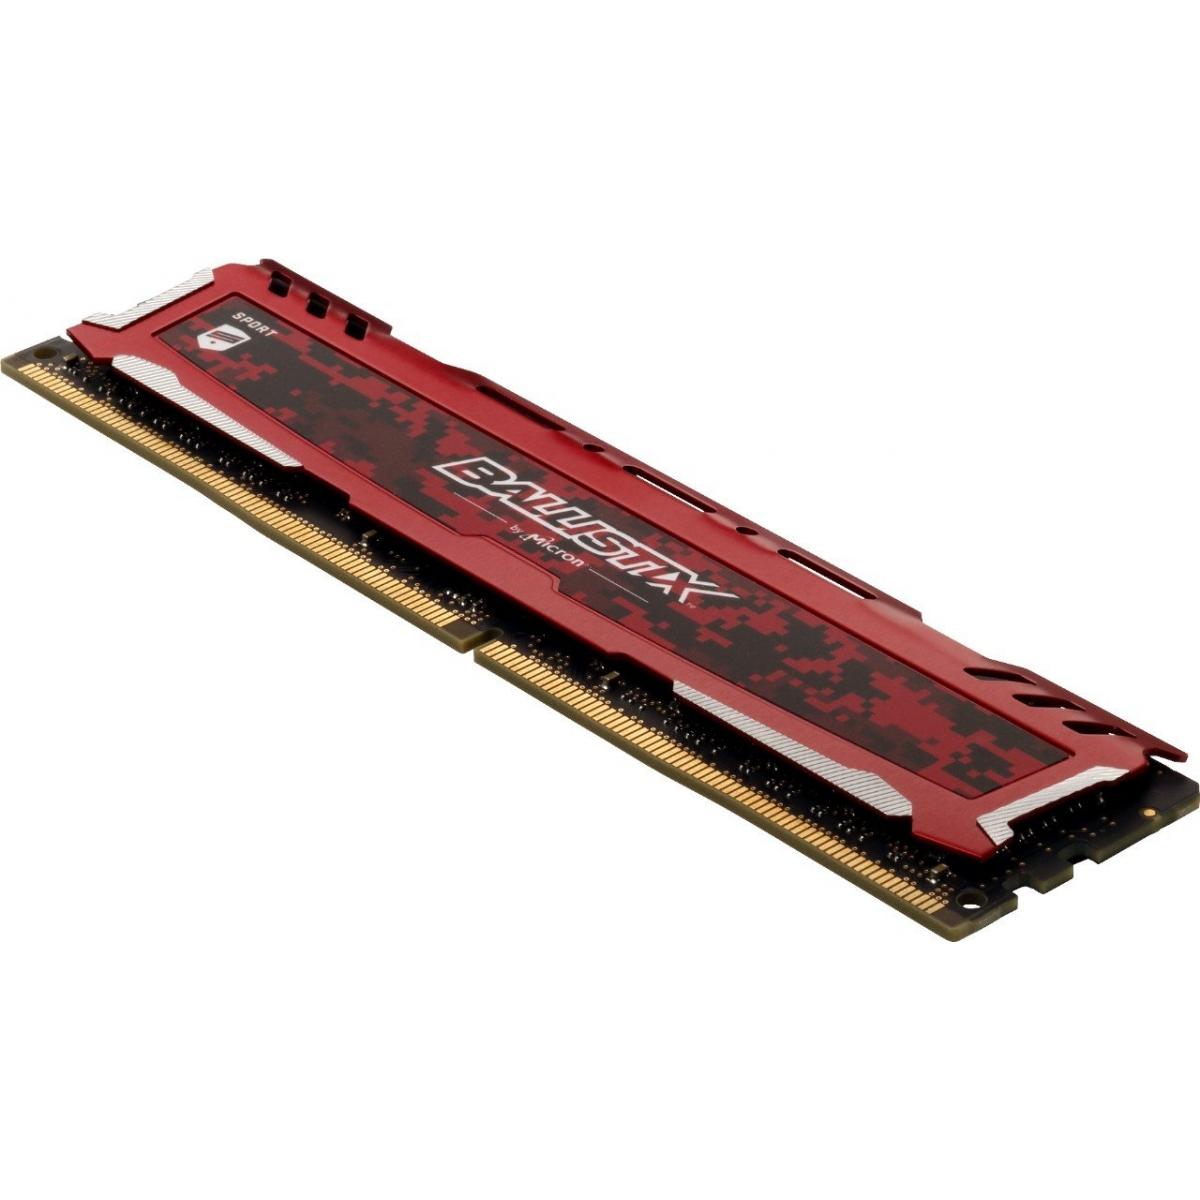 Memória DDR4 Crucial Ballistix Sport Lt, 16GB (2x8GB) 3200MHz, Red, BLS2K8G4D32AESEK